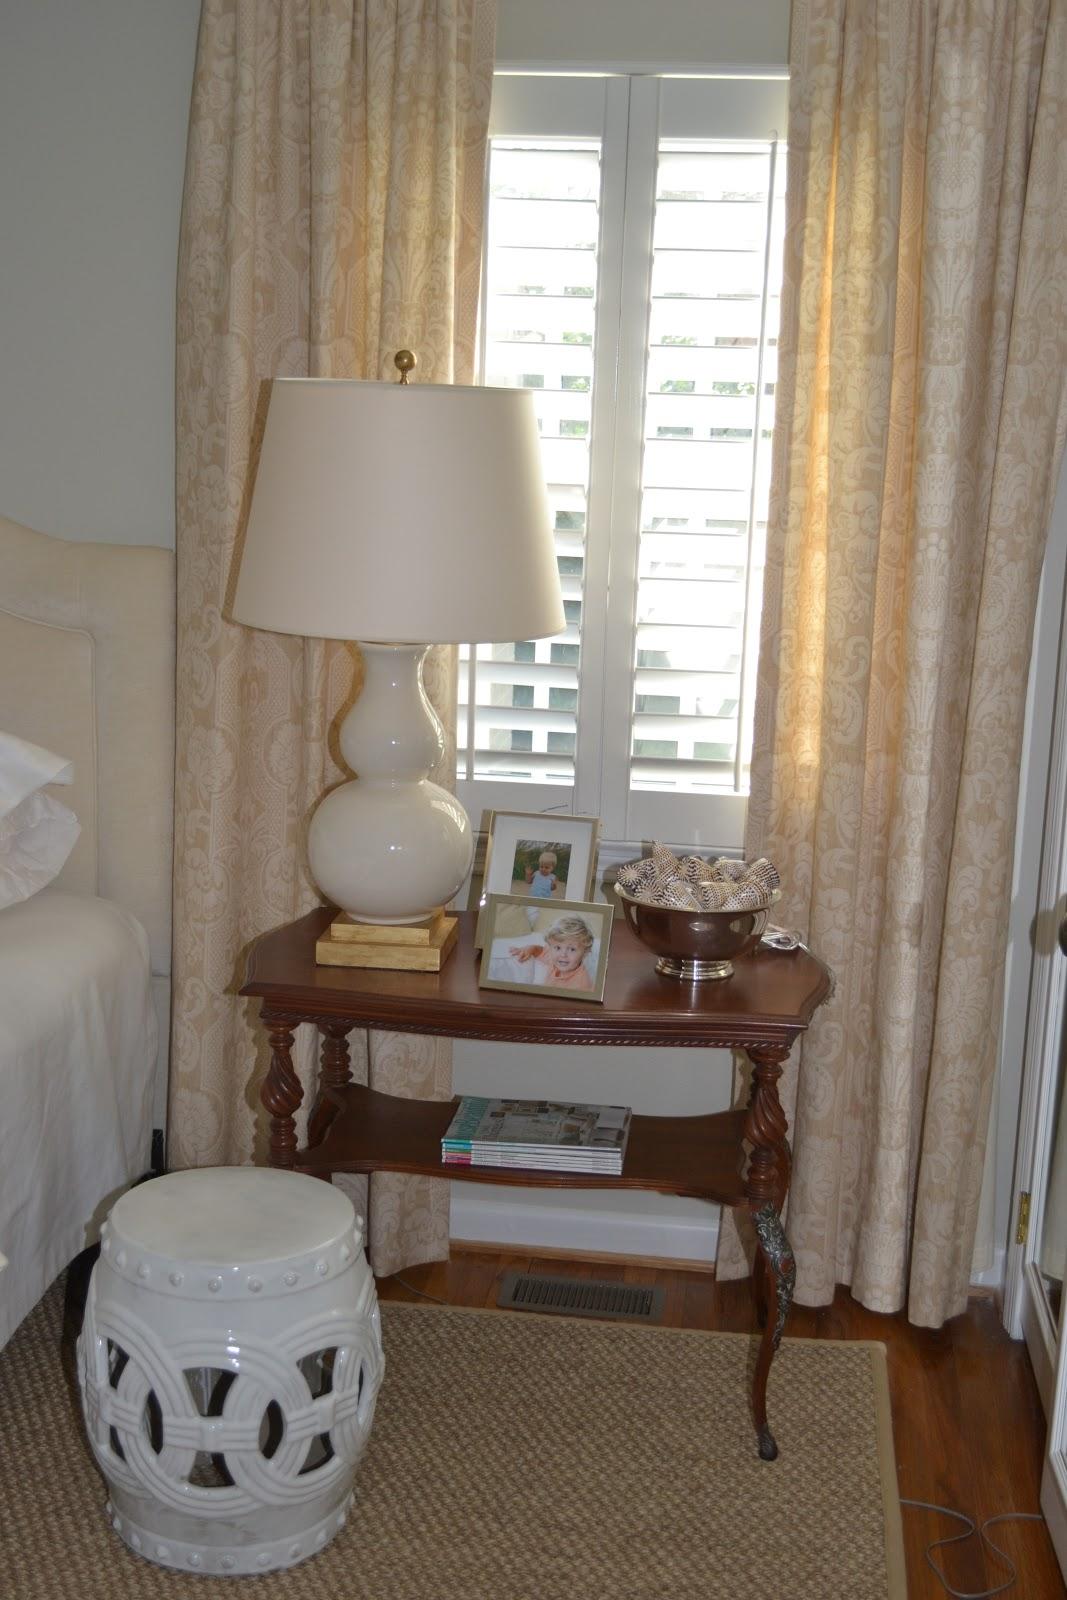 Interior Design Of Guest Room: LUCY WILLIAMS INTERIOR DESIGN BLOG: MY NEW GUEST ROOM